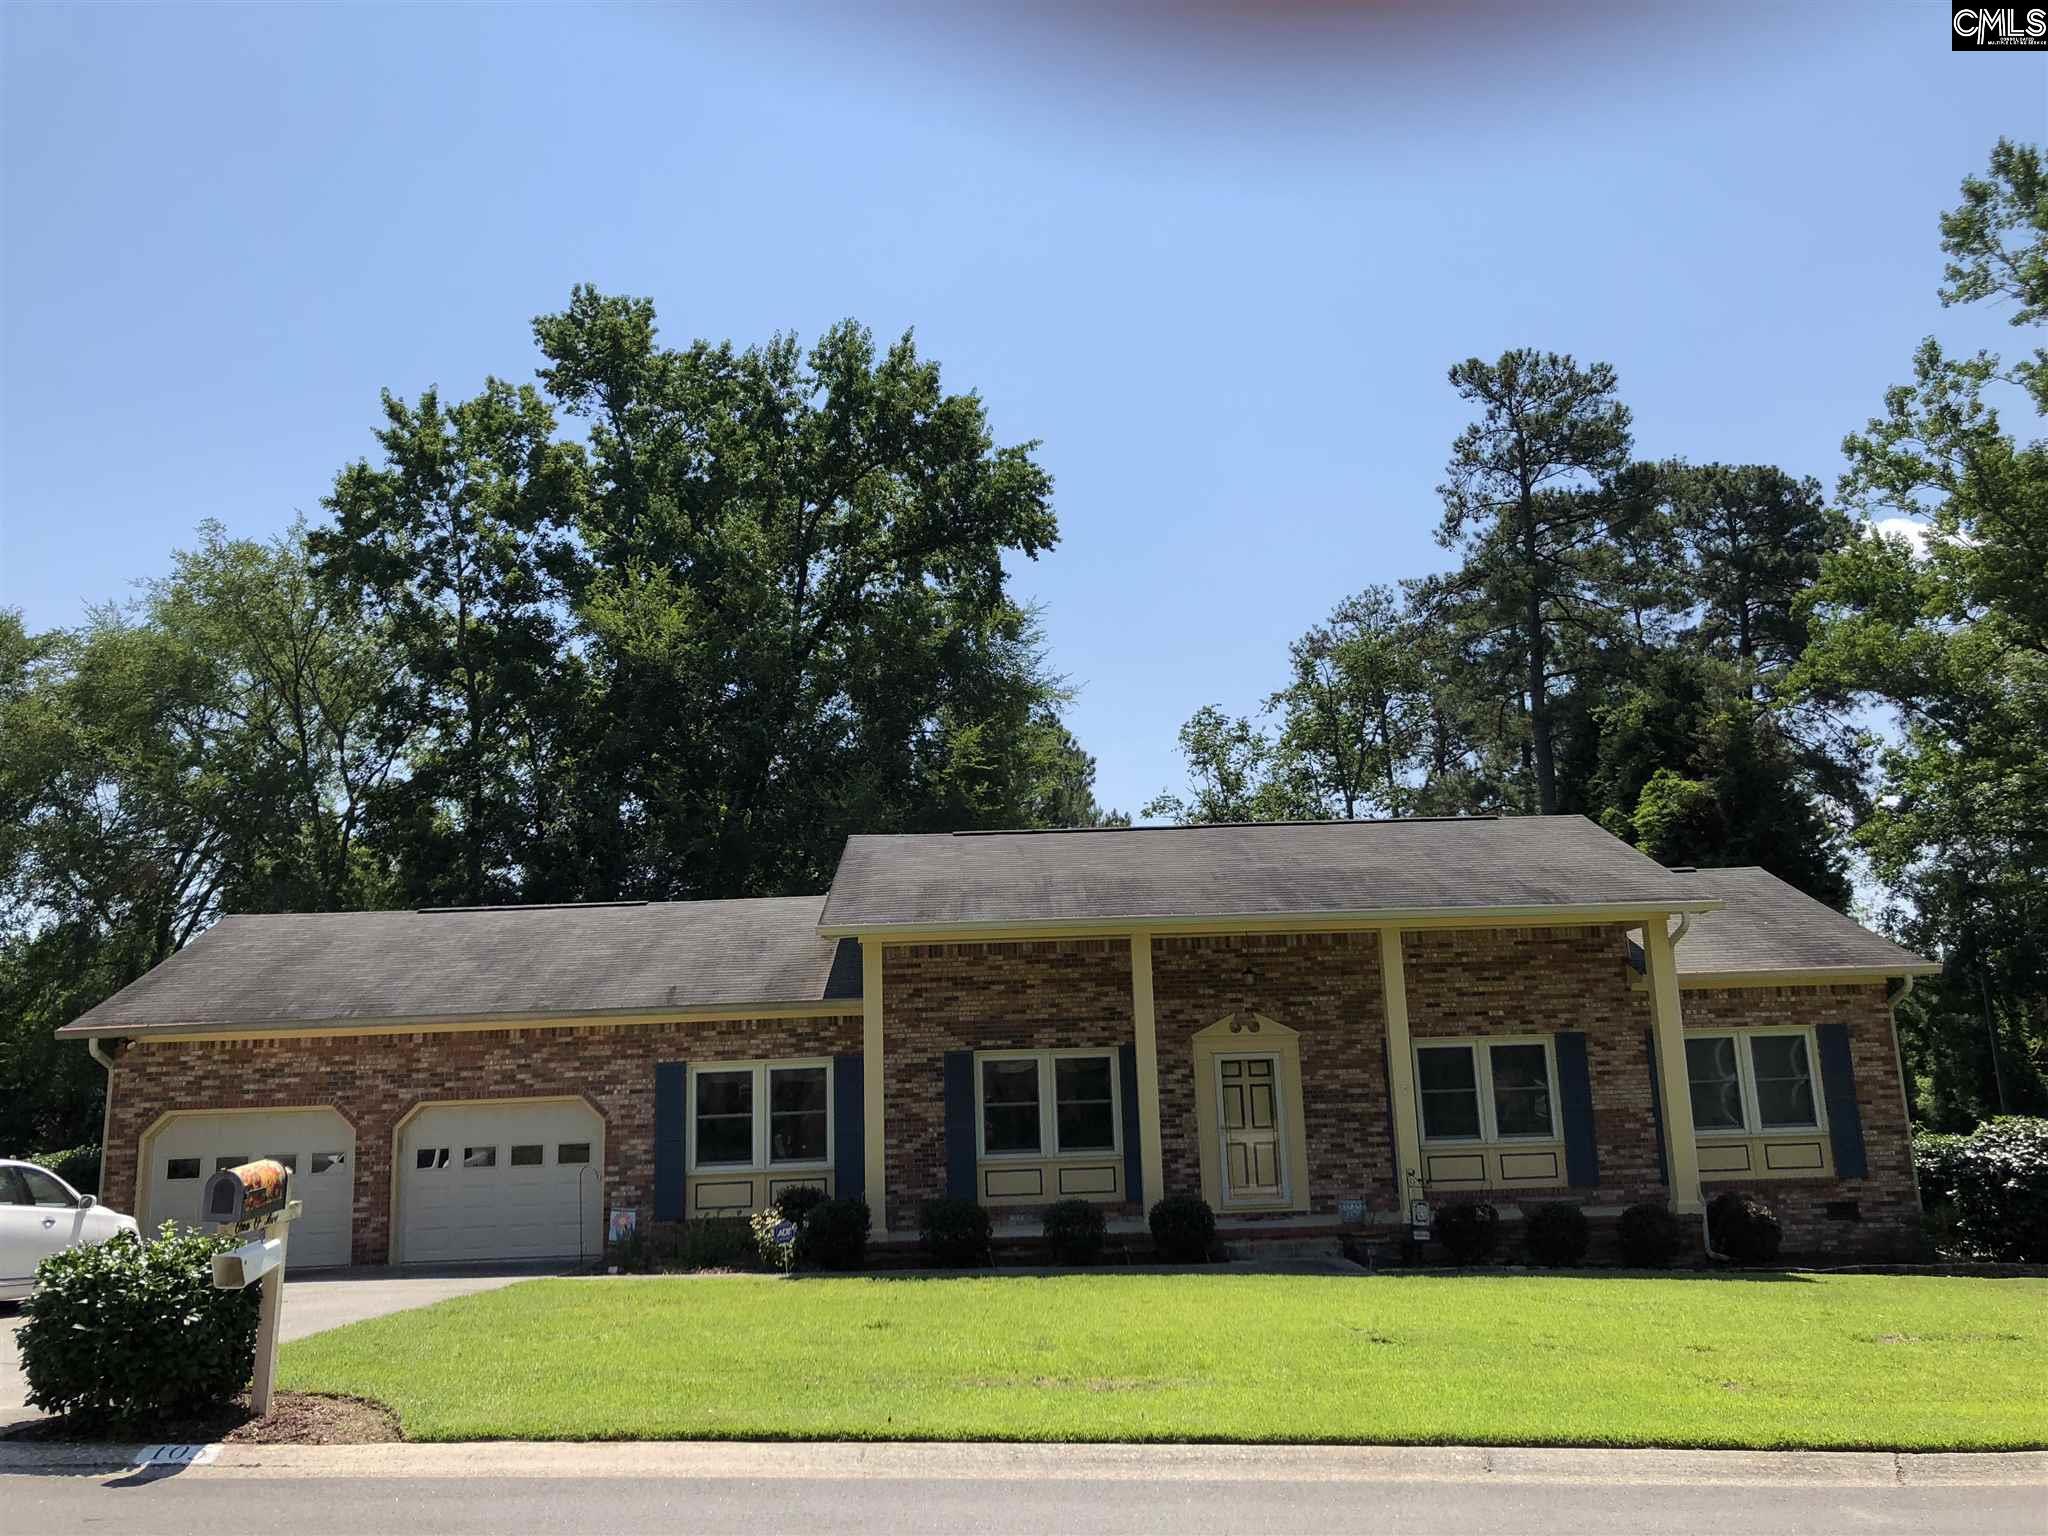 105 Summerfield Lexington, SC 29072-3426